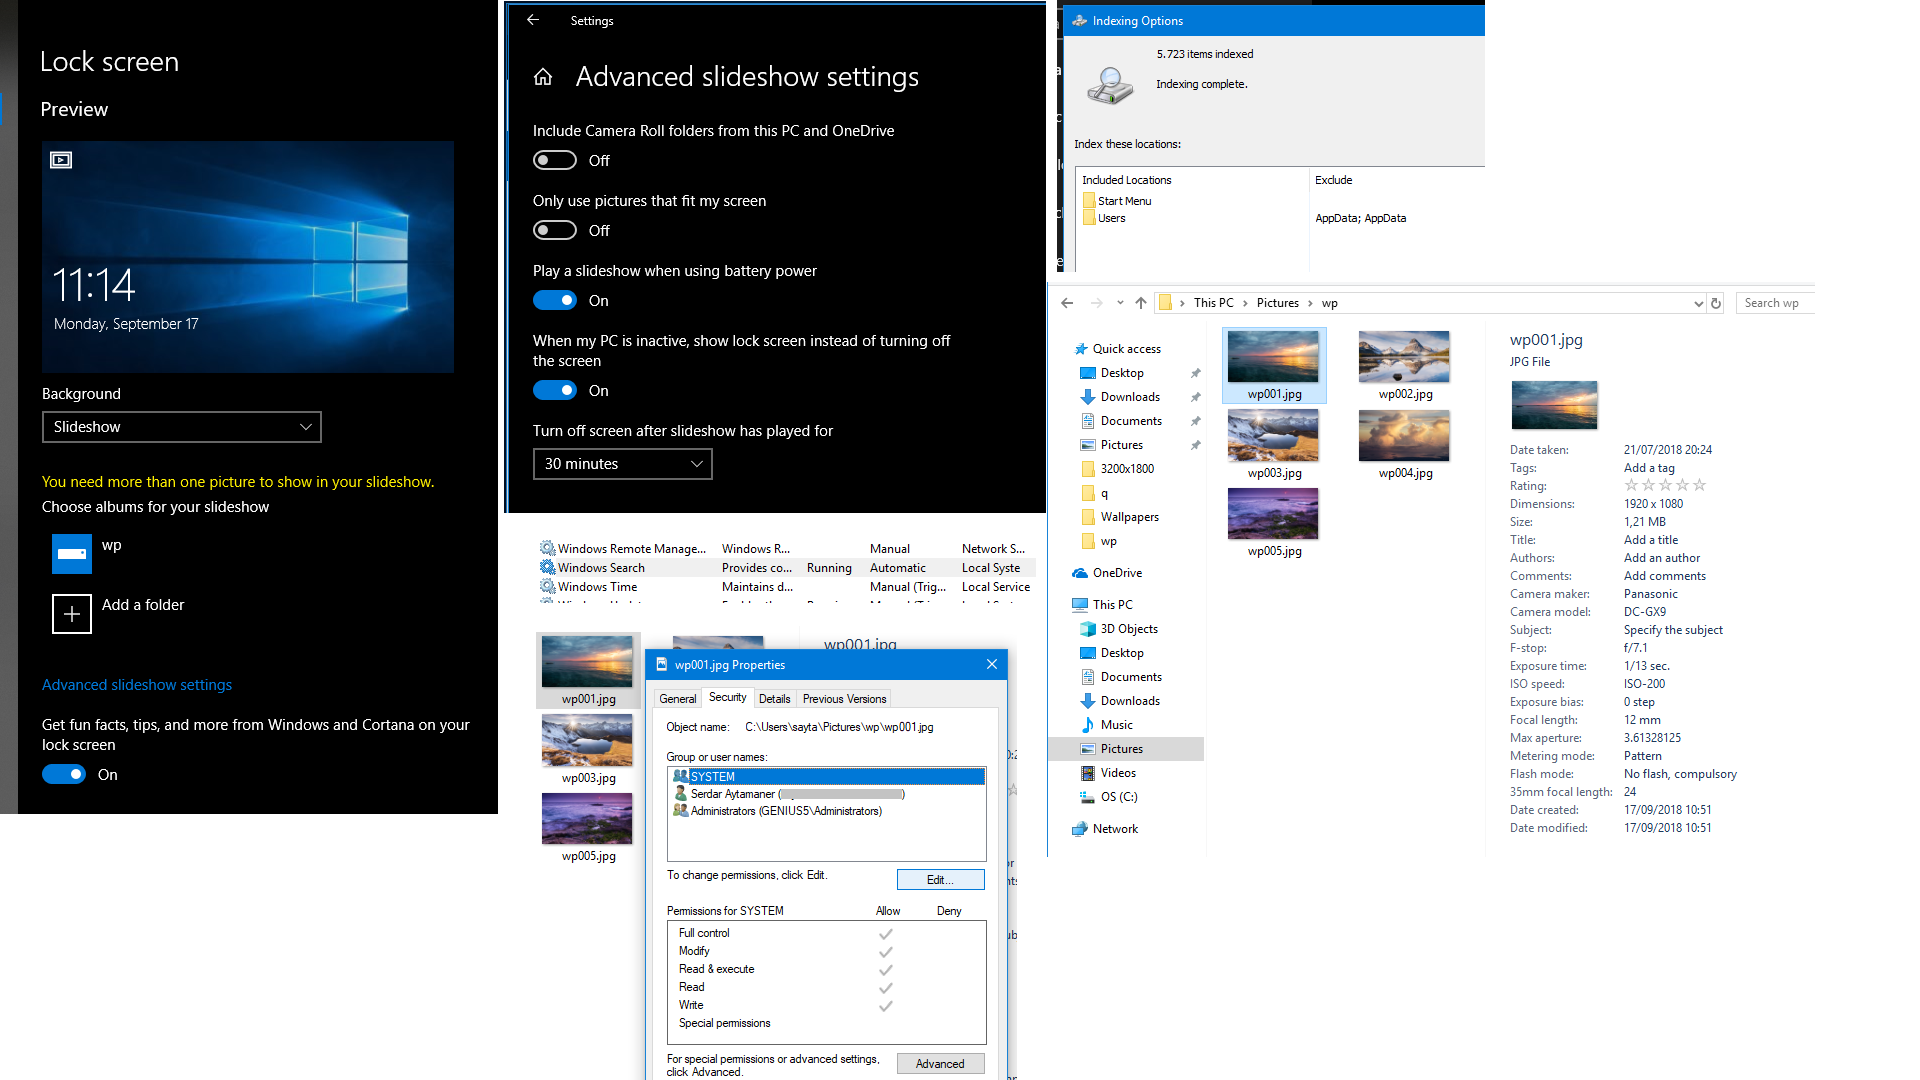 Windows 10 desktop wallpaper slideshow not working